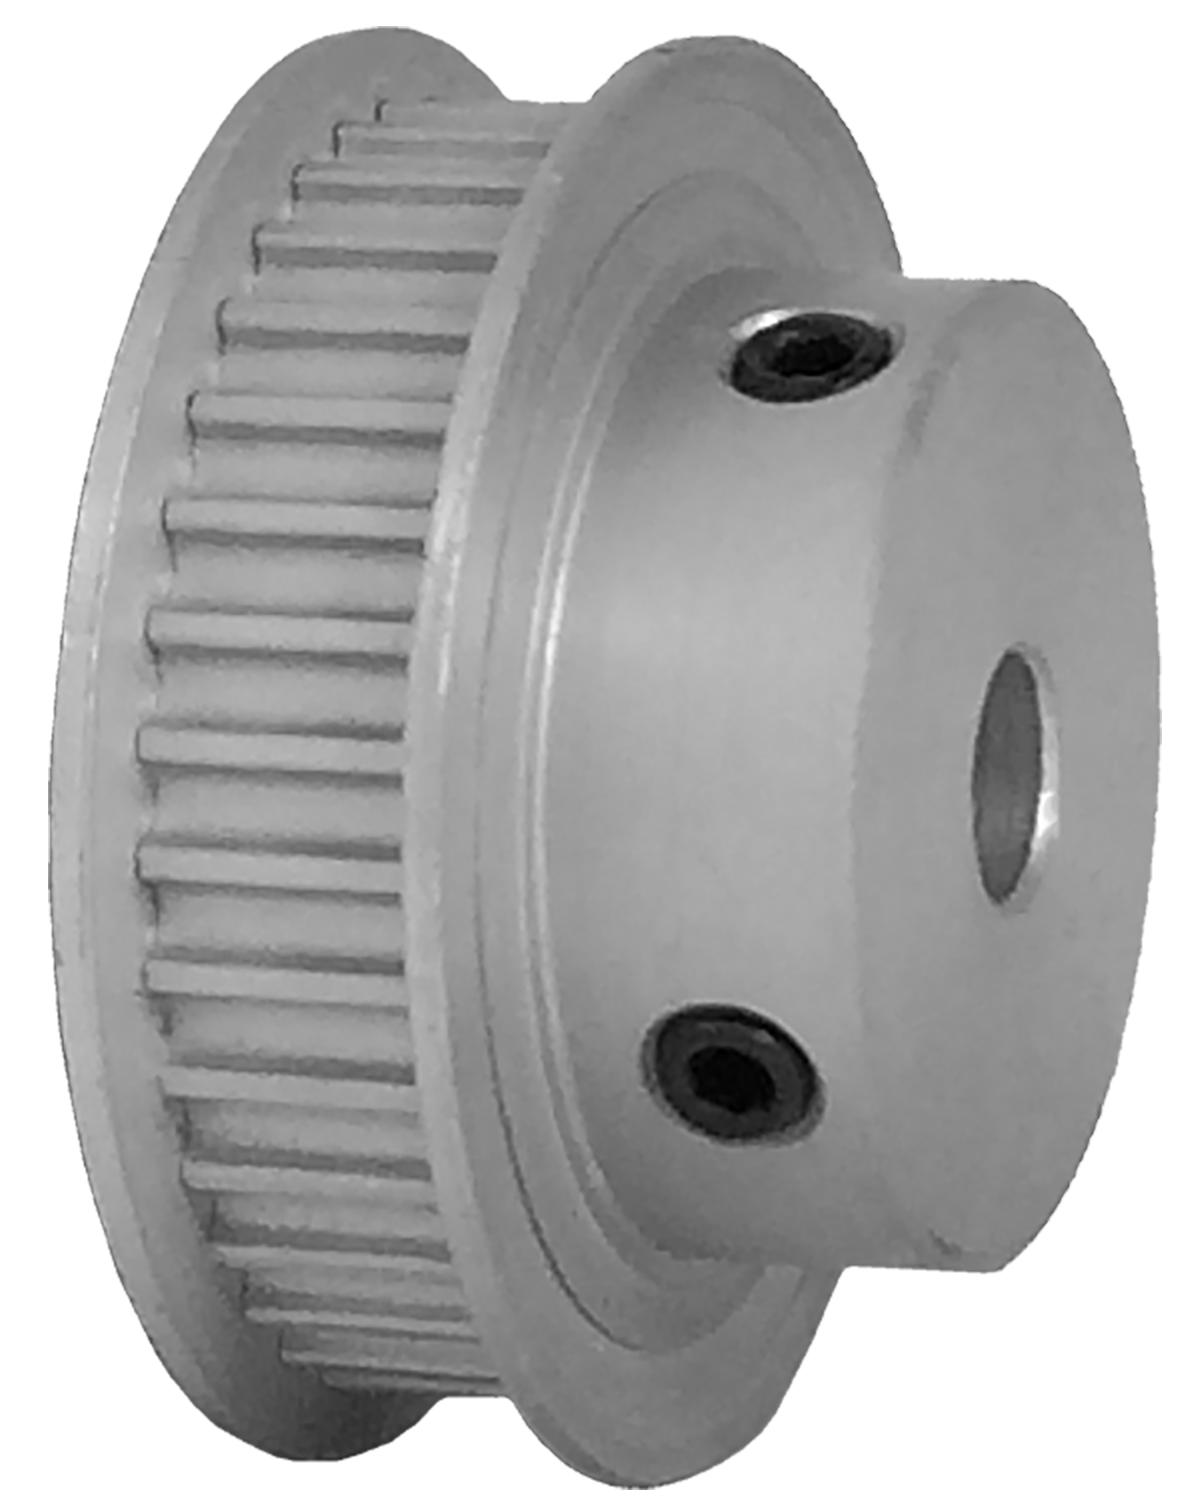 36-3M06-6FA3 - Aluminum Powerhouse®HTD® Pulleys